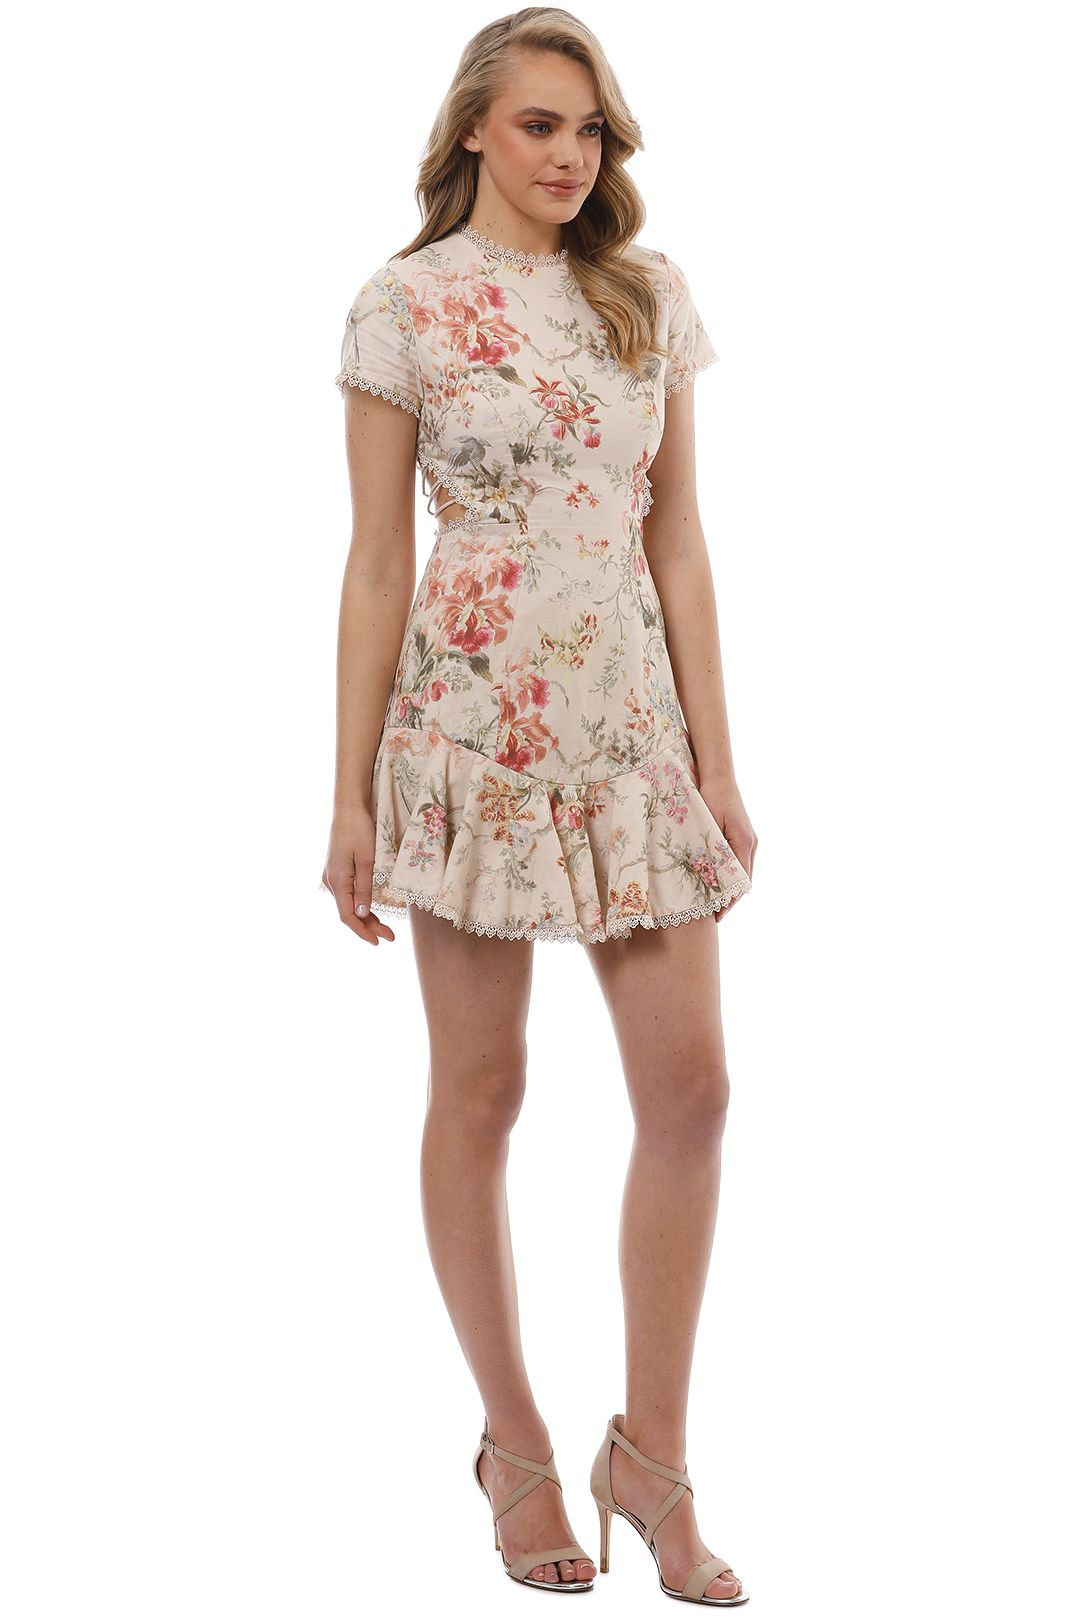 Zimmermann - Mercer Flutter Dress - Cream Floral - Side